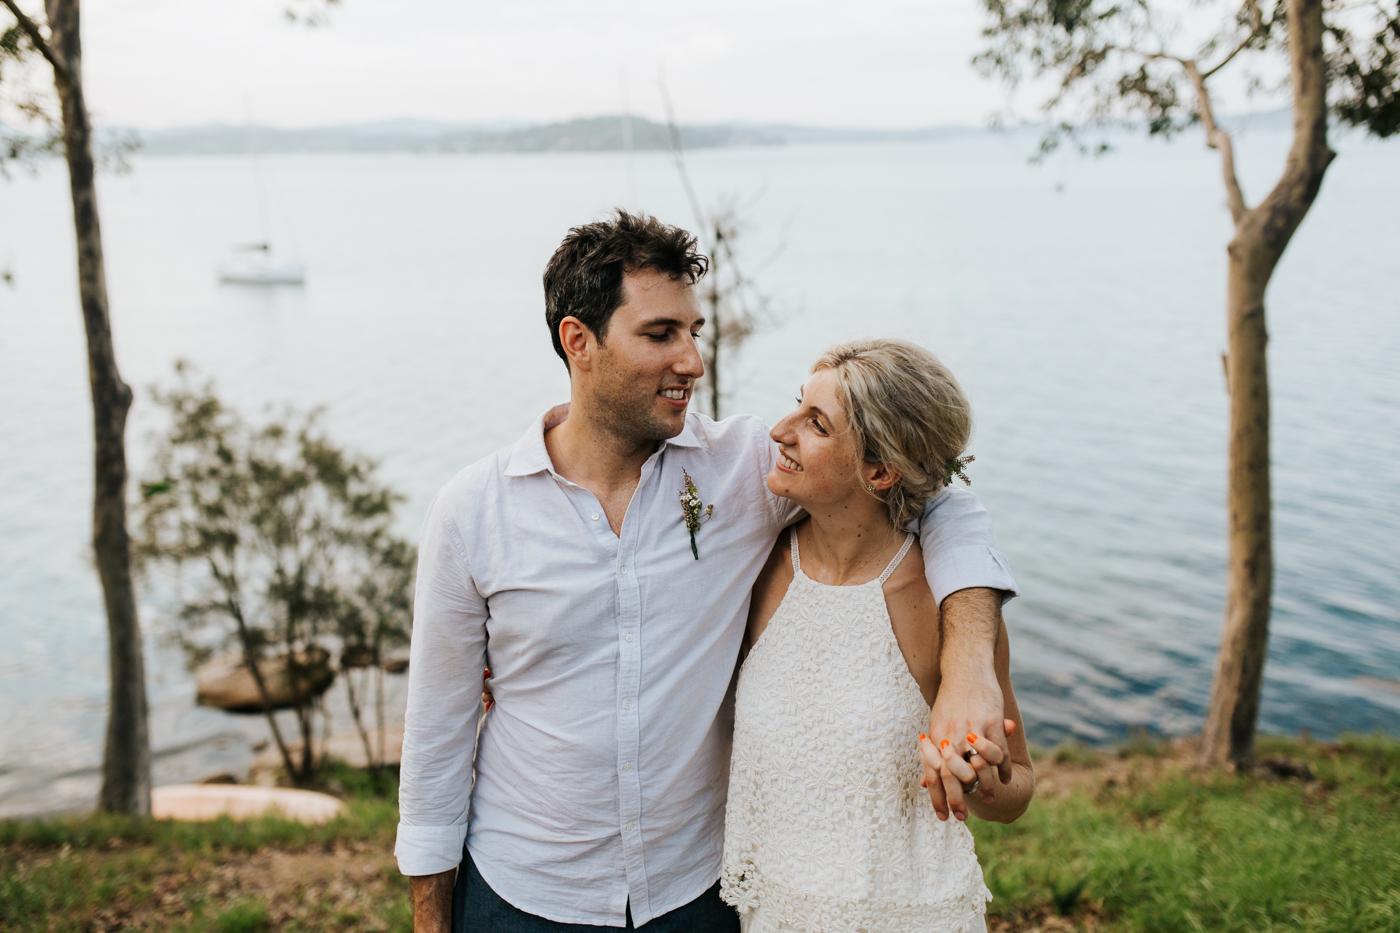 Emma & Ben - Lake Macquarie - Hunter Valley Wedding - Samantha Heather Photography-219.jpg